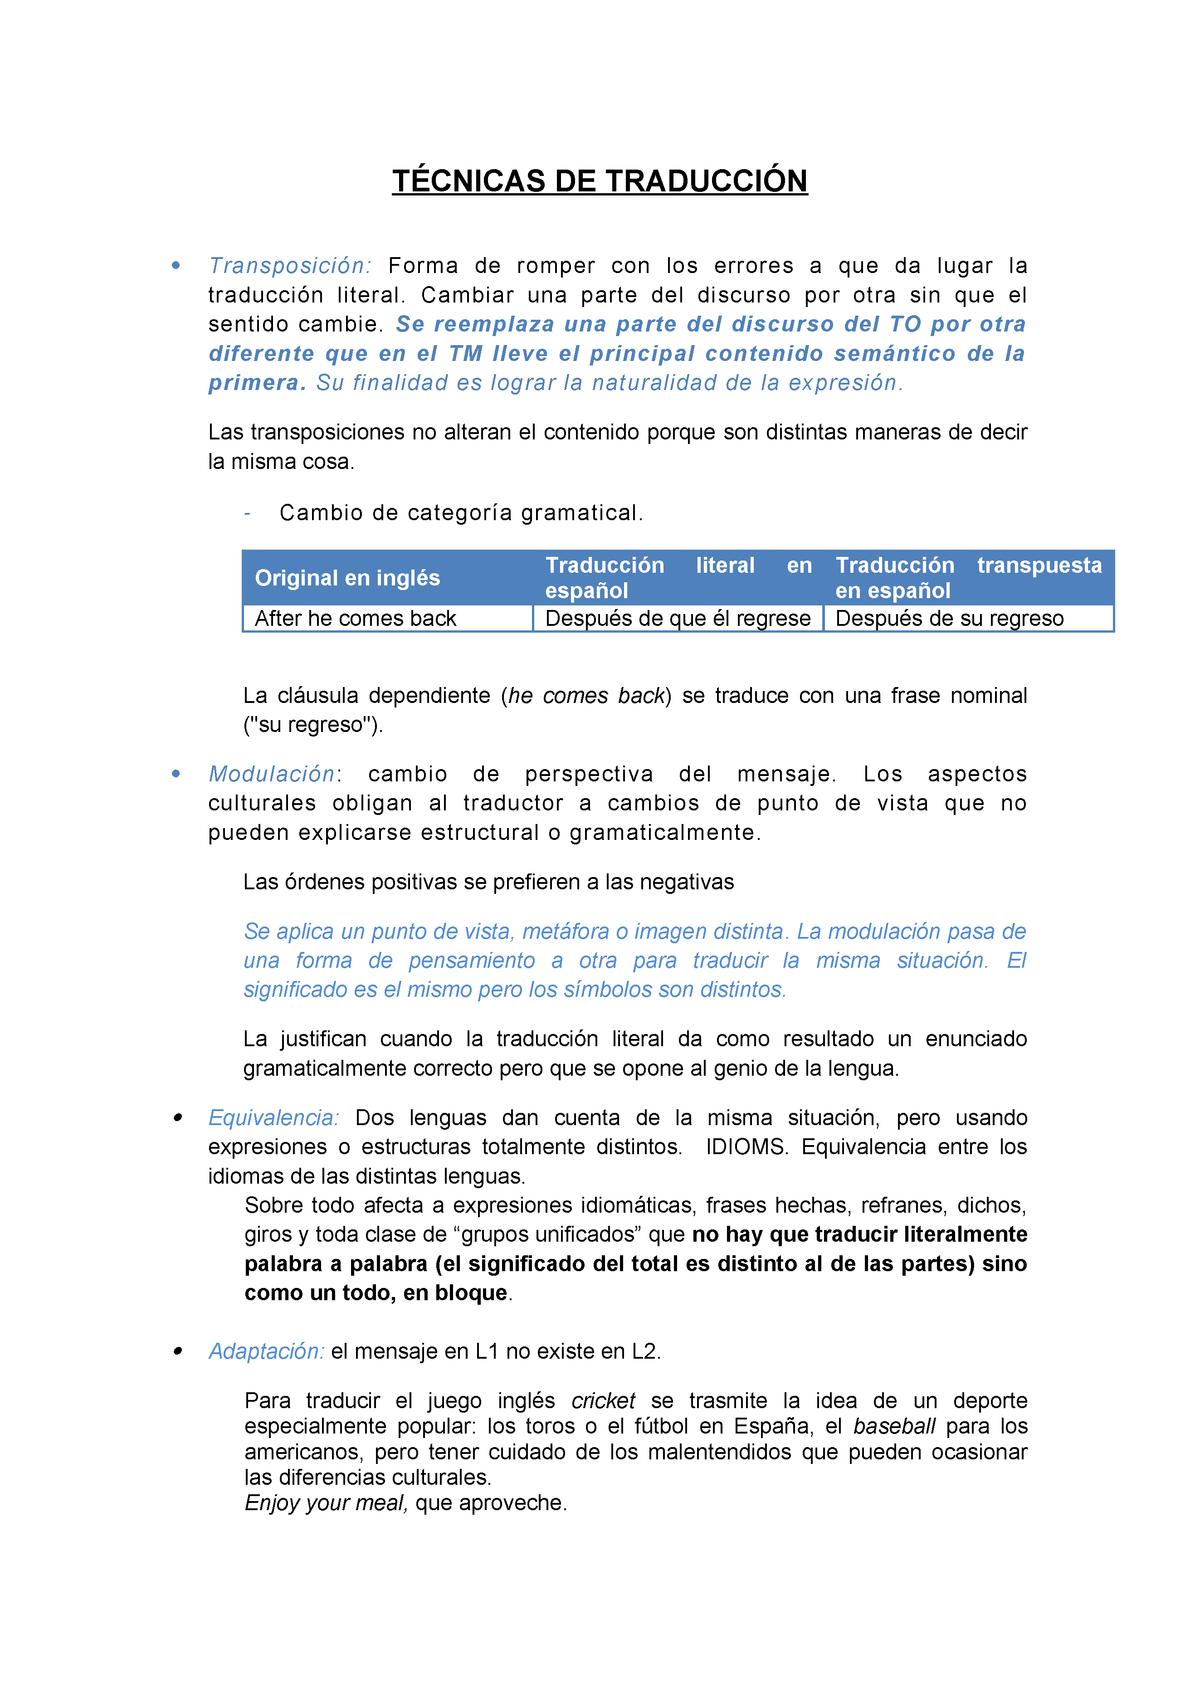 Apuntes Leccion 1 Rosa Fernández 41086 Uva Studocu